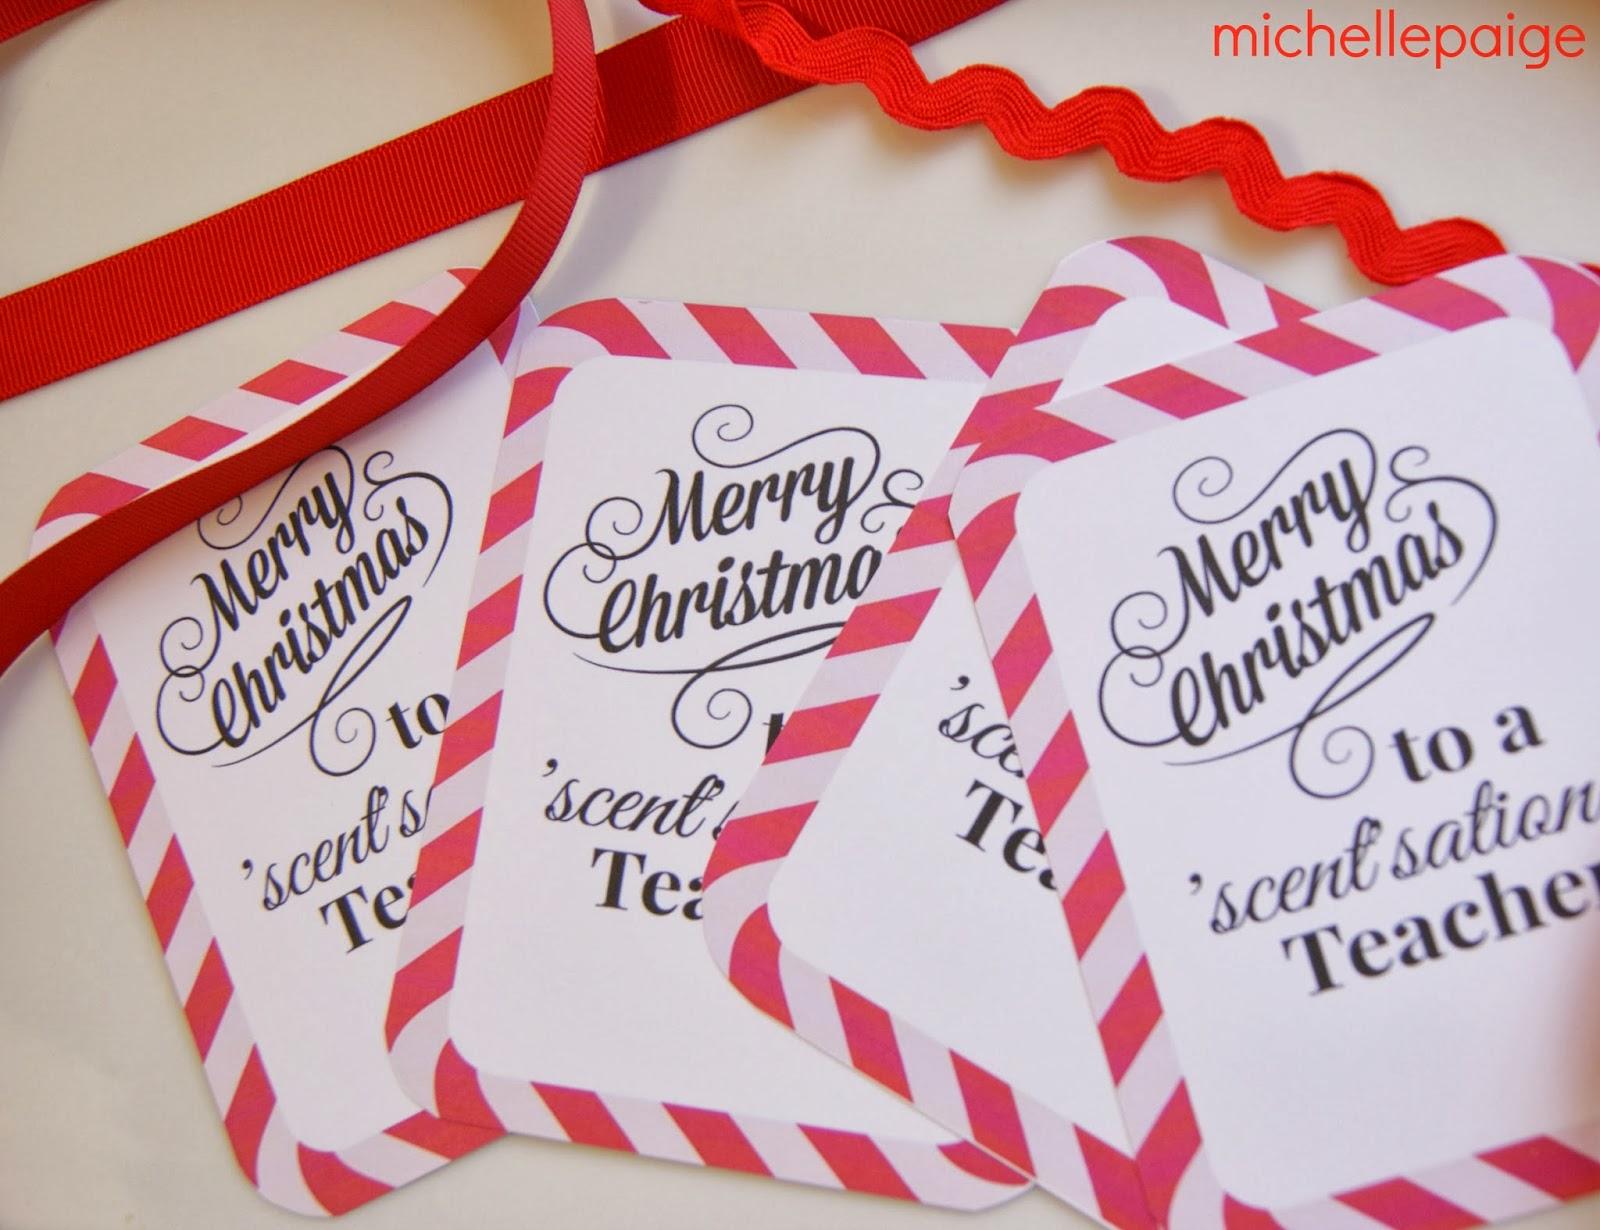 Michelle Paige Blogs: Quick Teacher Soap Gift For Christmas - Scentsational Teacher Free Printable